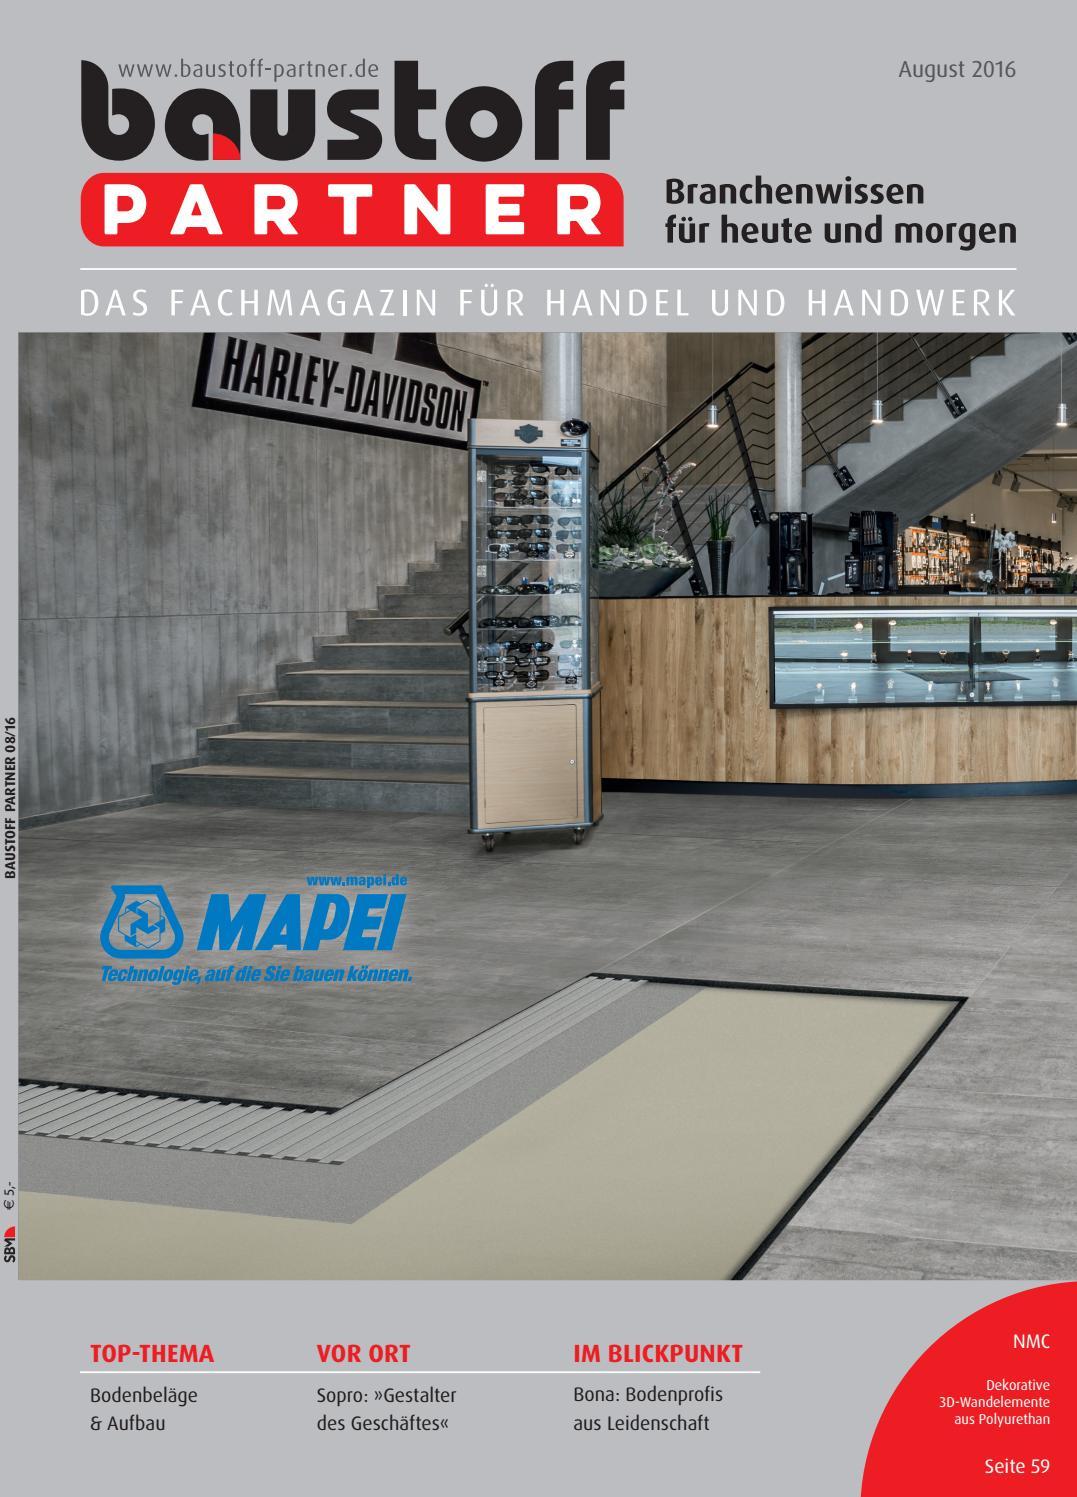 Baustoff Partner August 20 by SBM Verlag GmbH   issuu